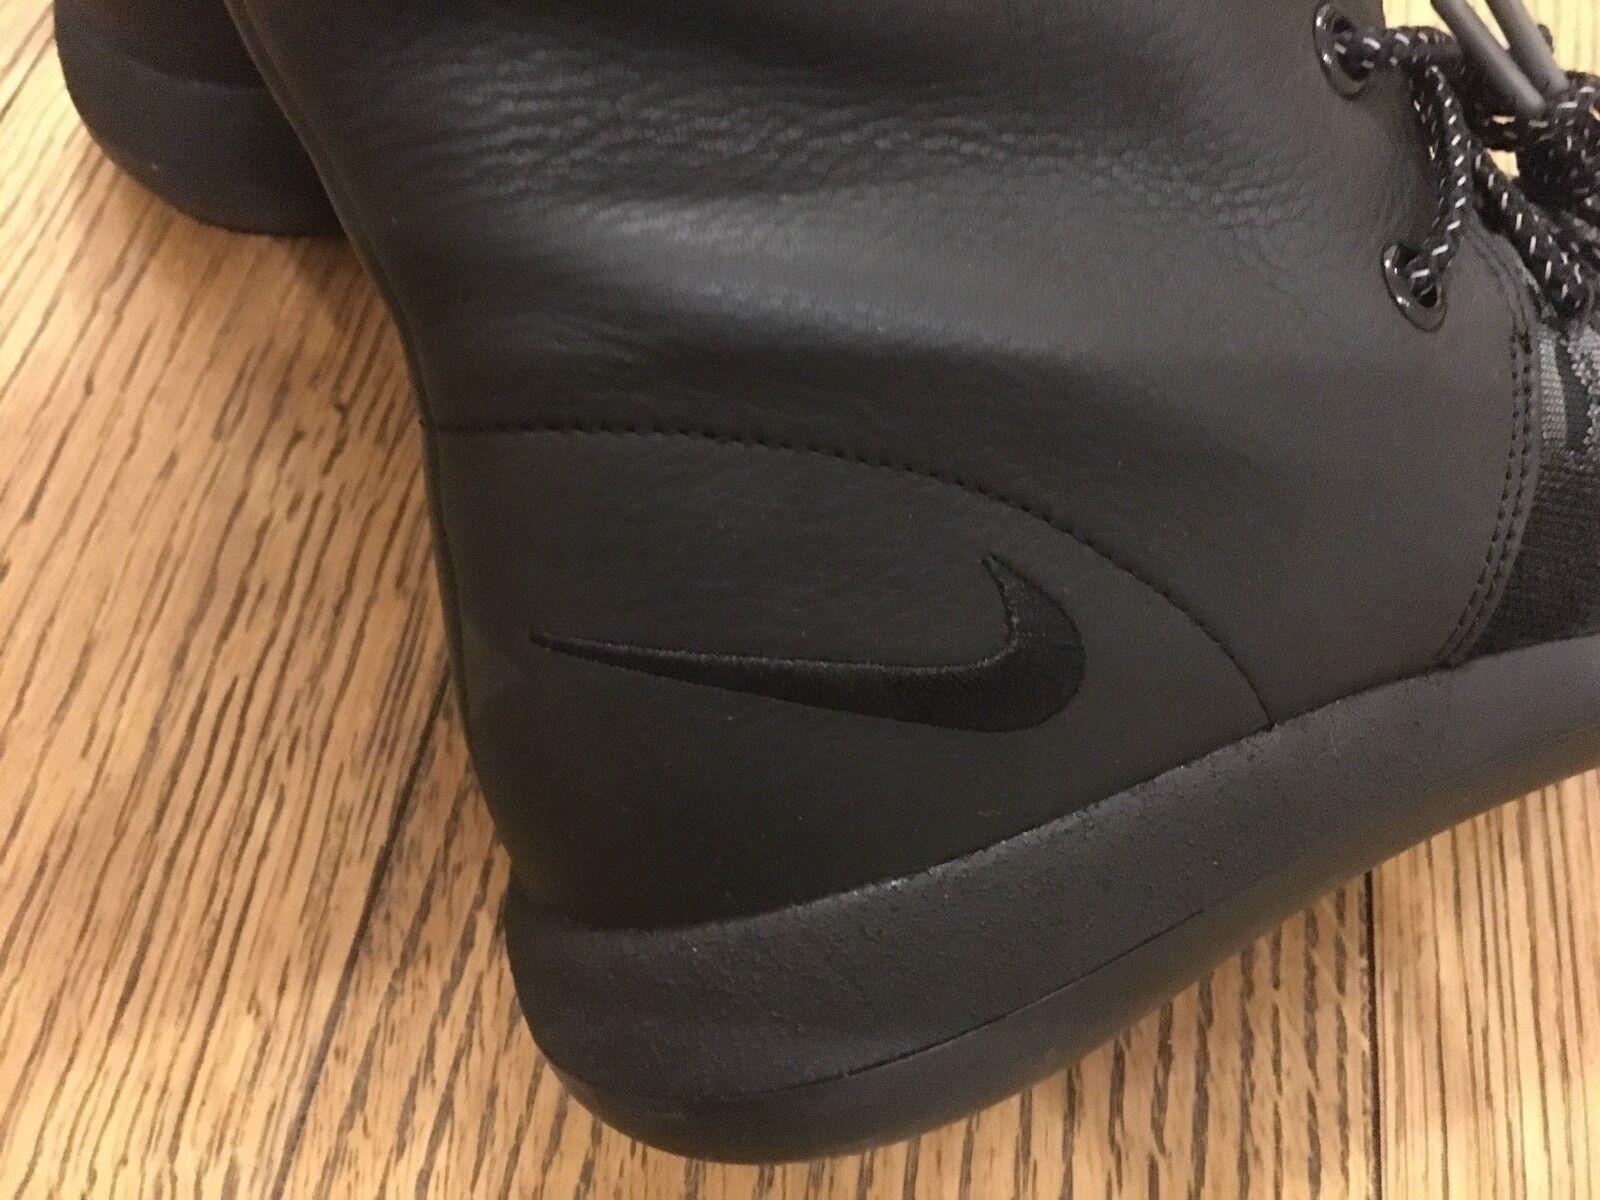 Nike roshe zwei hi flyknit 861708-001 schwarz schwarz schwarz - grau sneakerboot selten frauen 1293bb